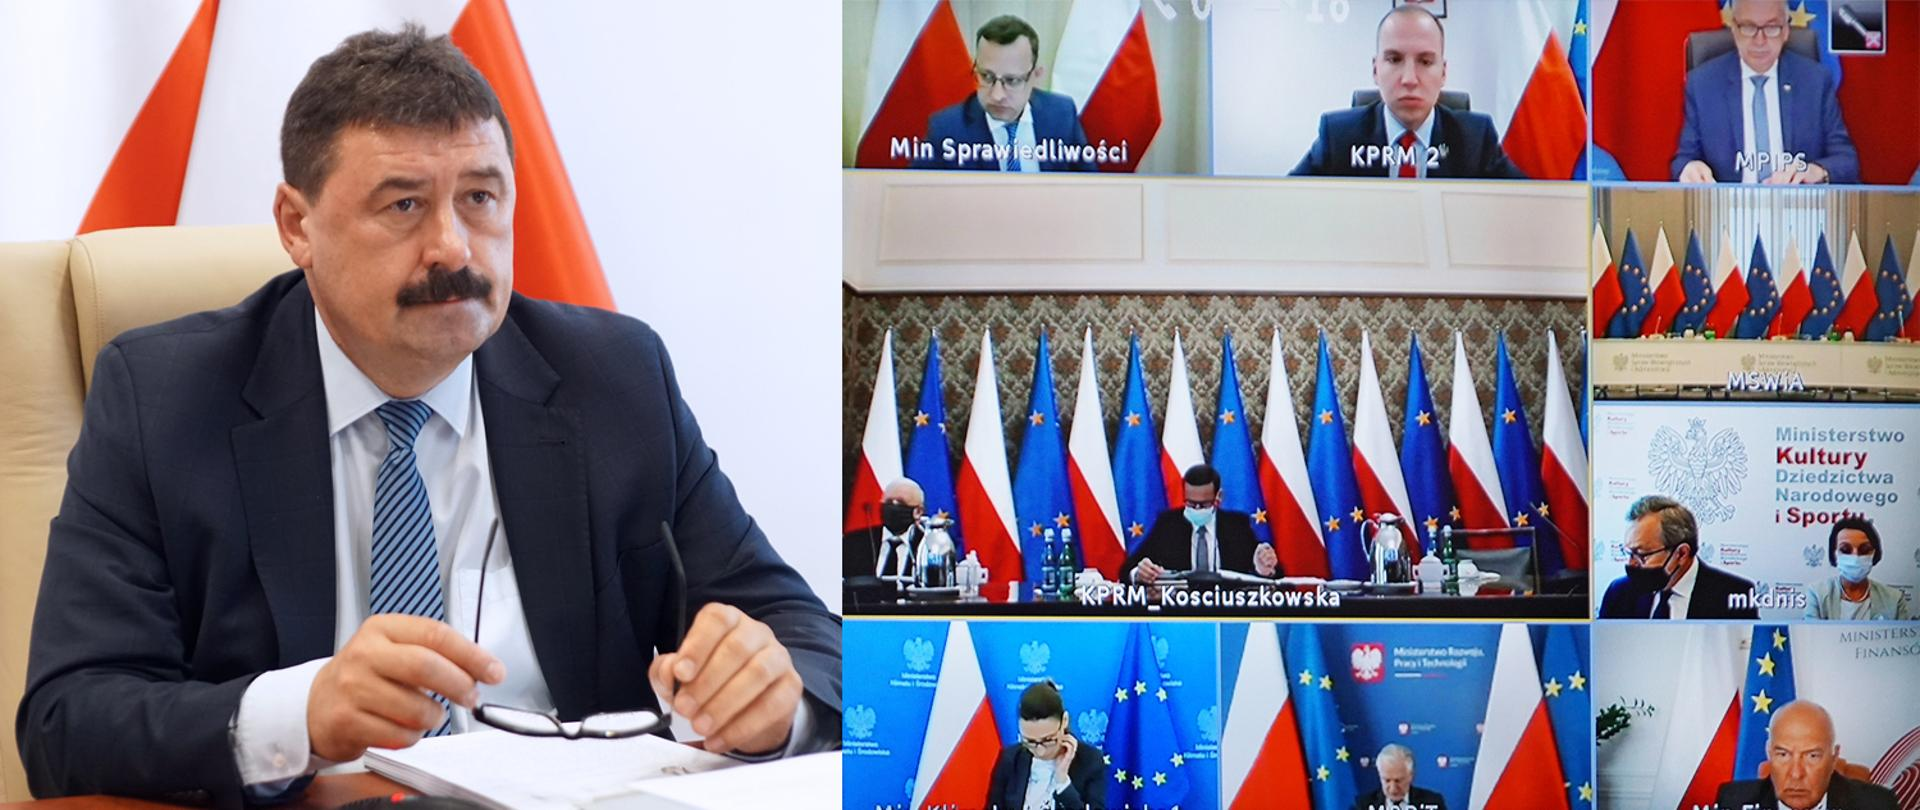 Sekretarz stanu Ryszard Bartosik